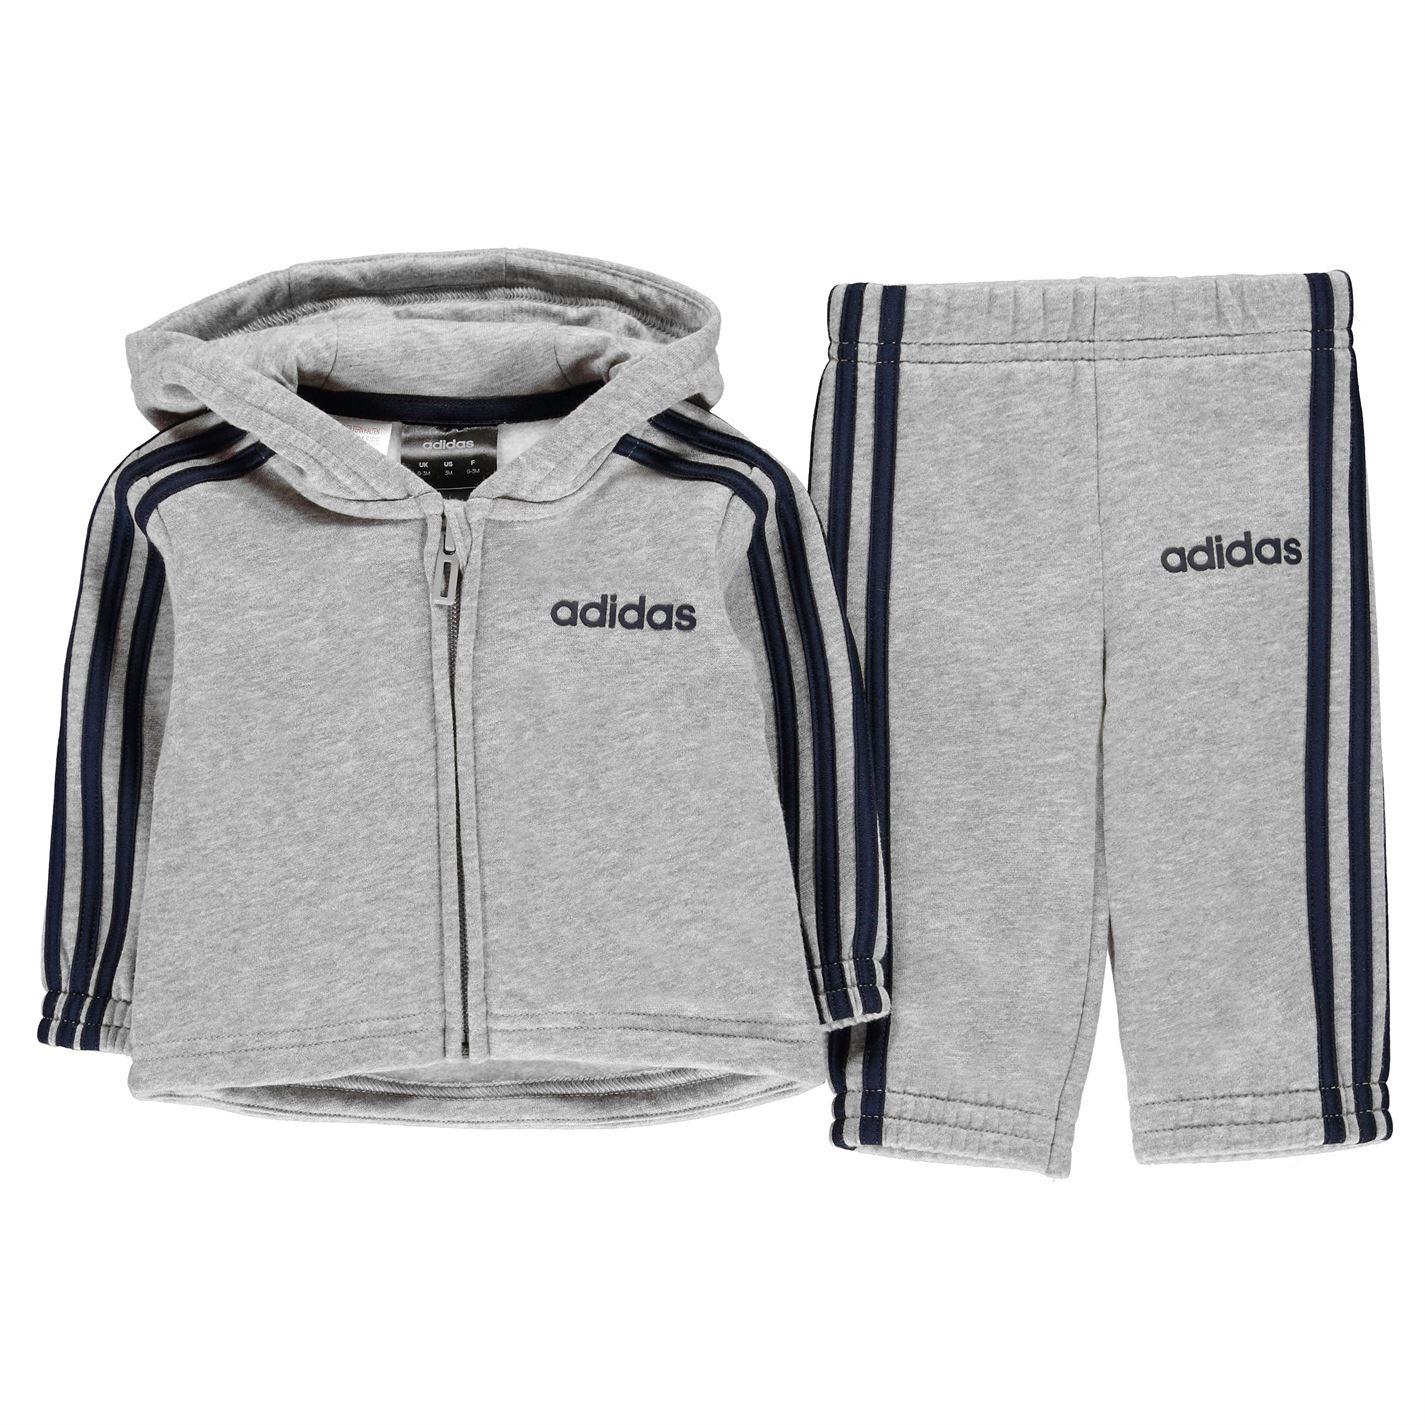 Adidas 3 Stripe Hoodie Tracksuit Baby Boys